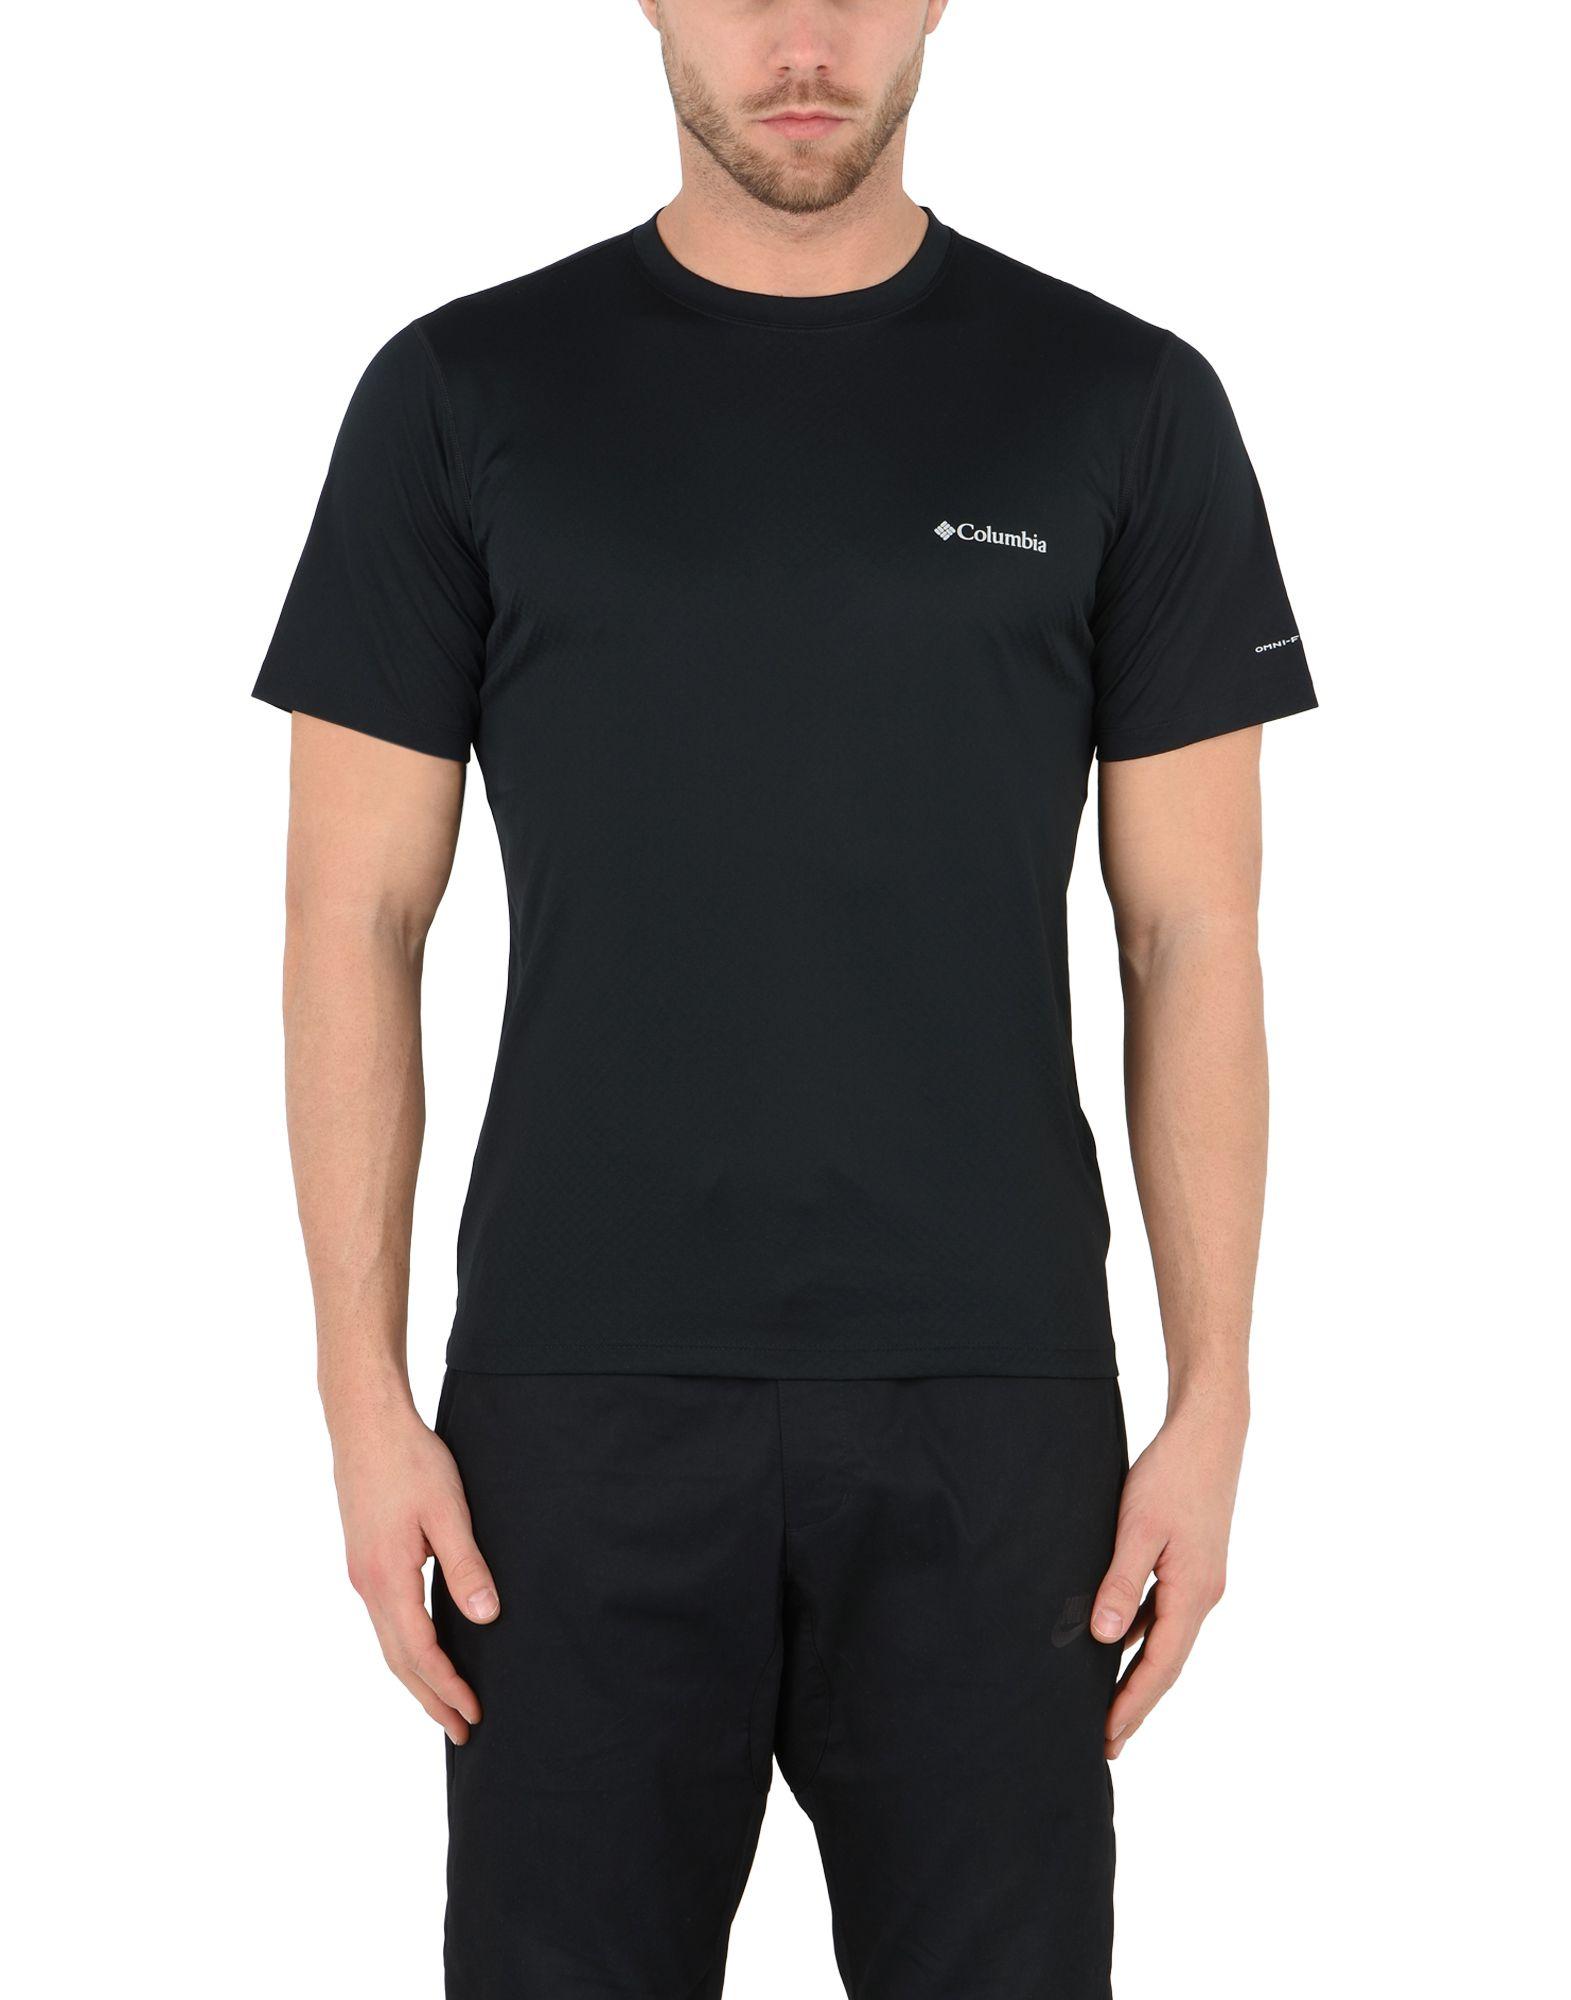 T-Shirt Sportiva Columbia Zero Rules  Short Short  Sleeve Shirt - Uomo - 12003220NE 33b791